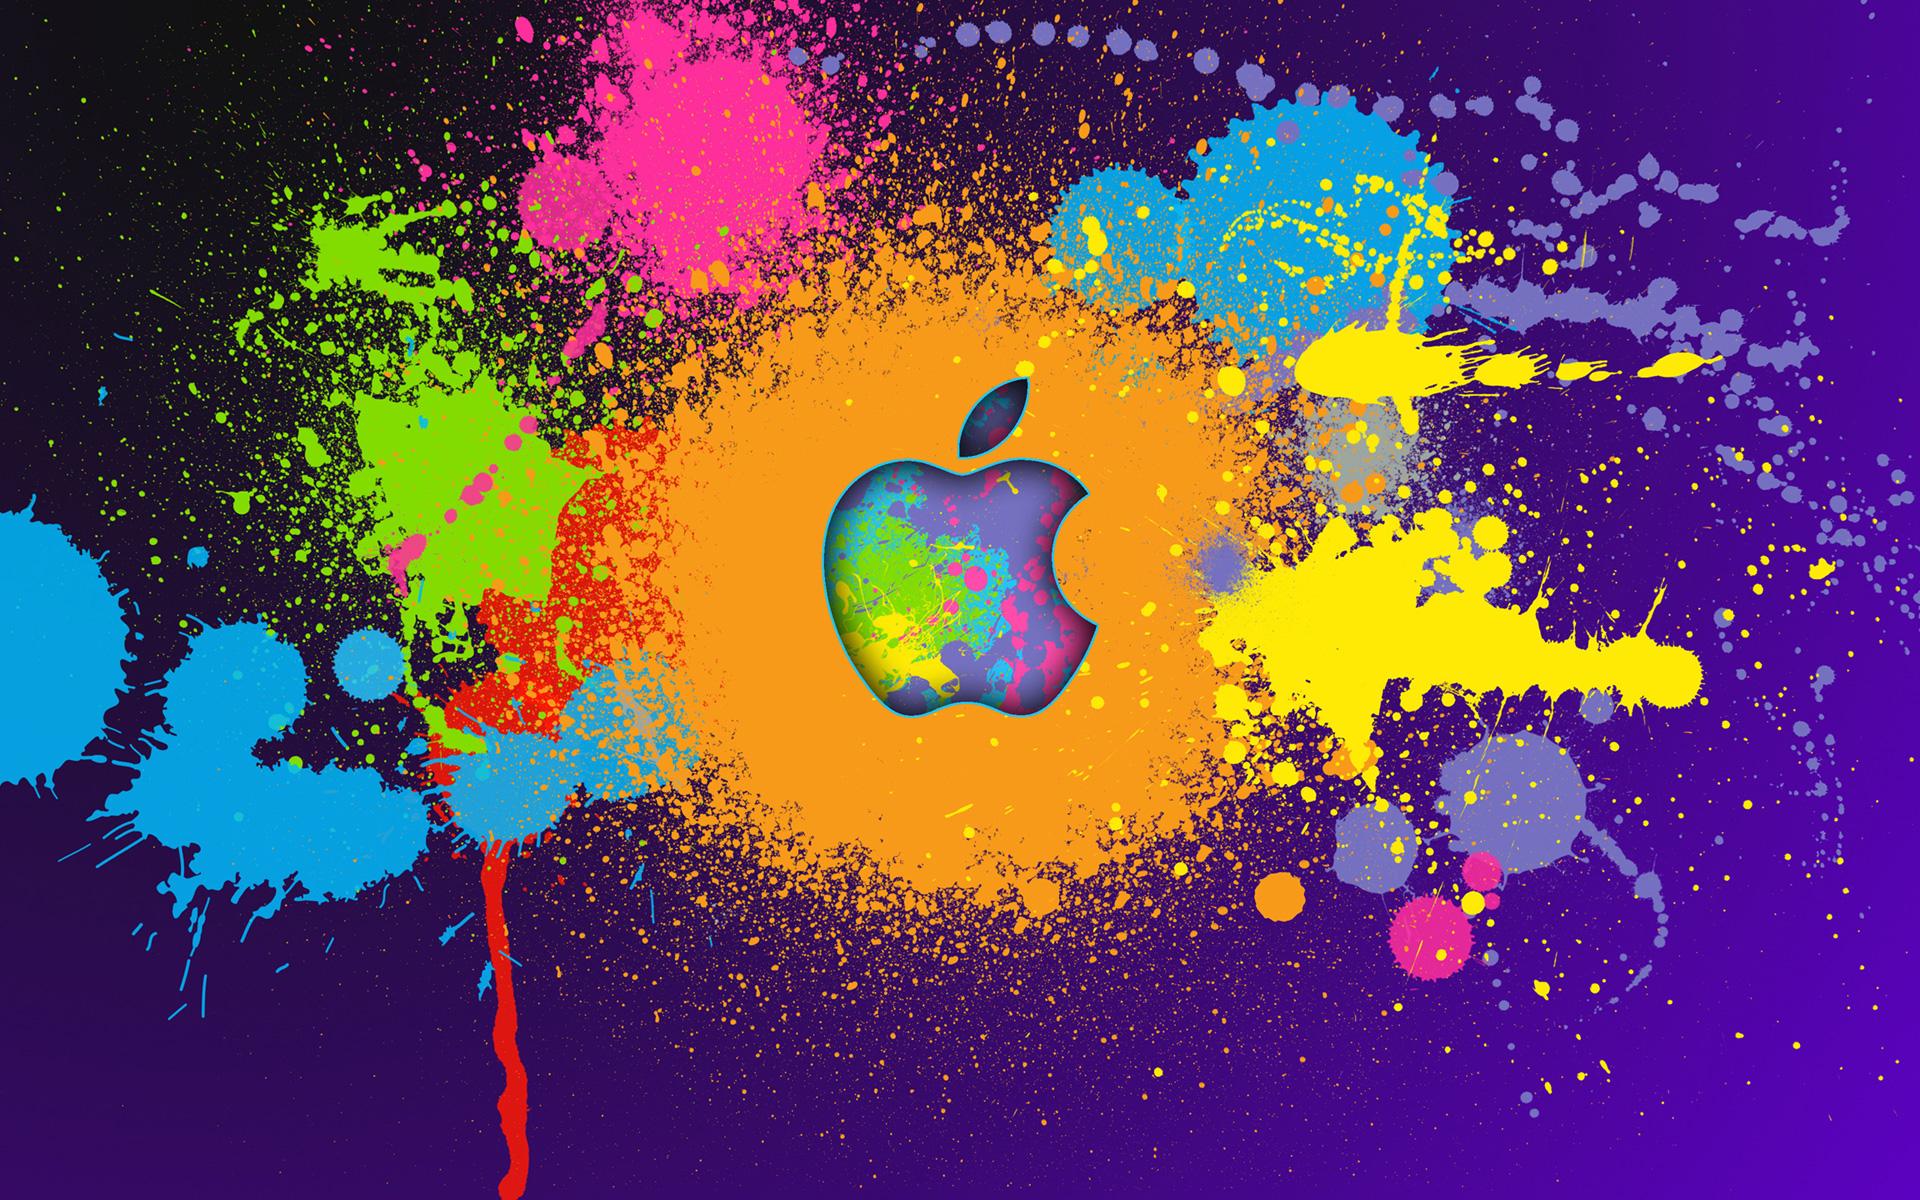 Sfondi desktop hd apple ipad sfondi hd gratis for Immagini hd apple